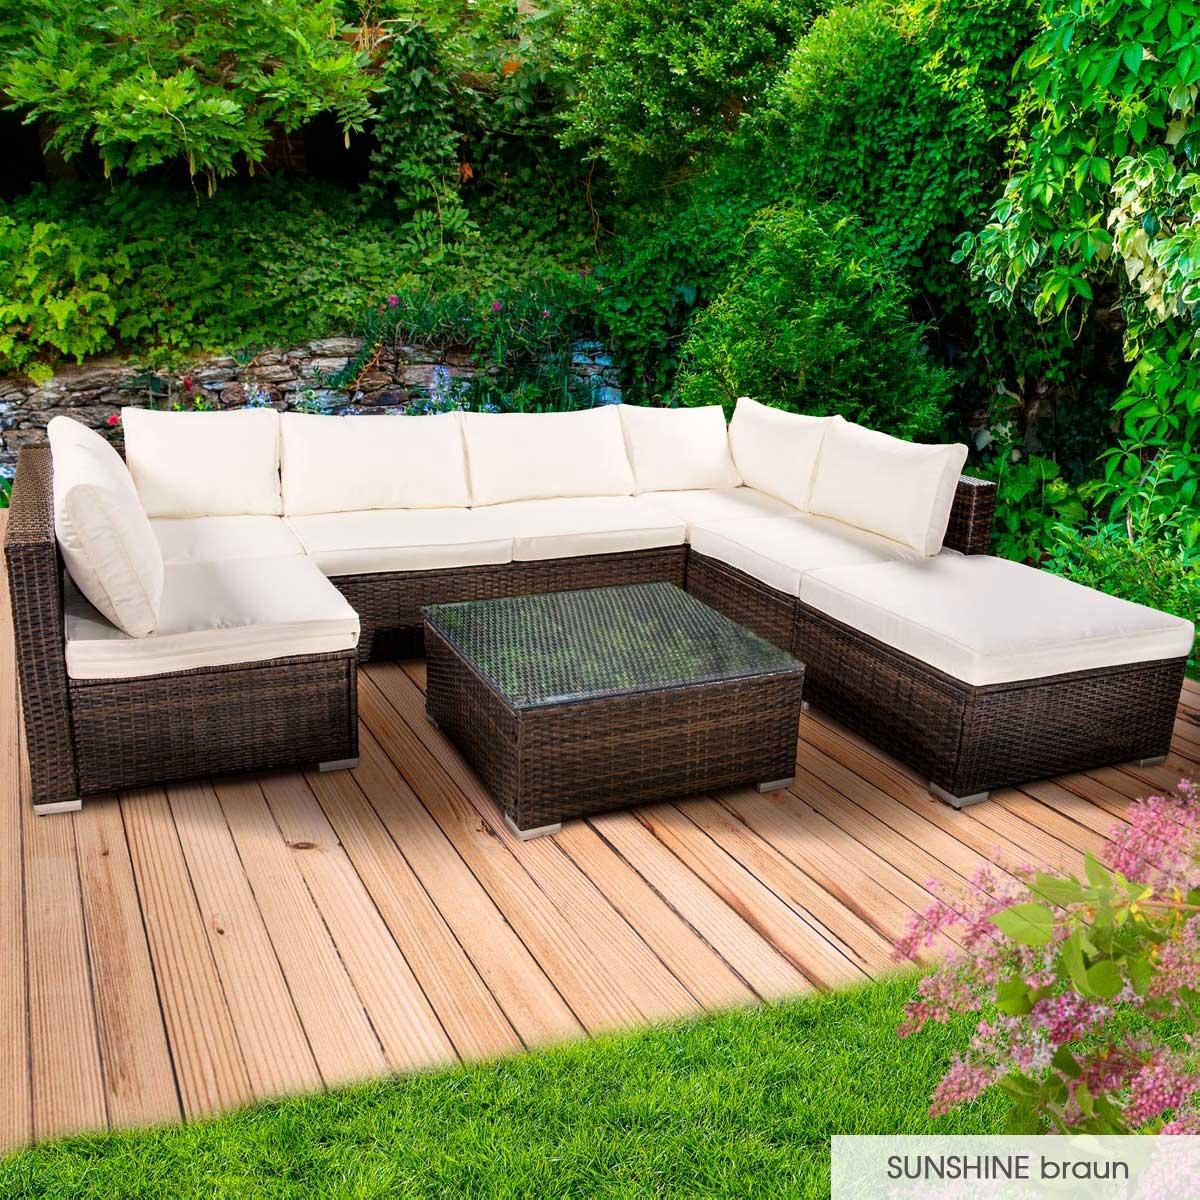 Gartenmoebel-Poly-Rattan-Lounge-Moebel-Sitzgarnitur-Gartengarnitur-Sitzgruppe-Sofa Indexbild 26